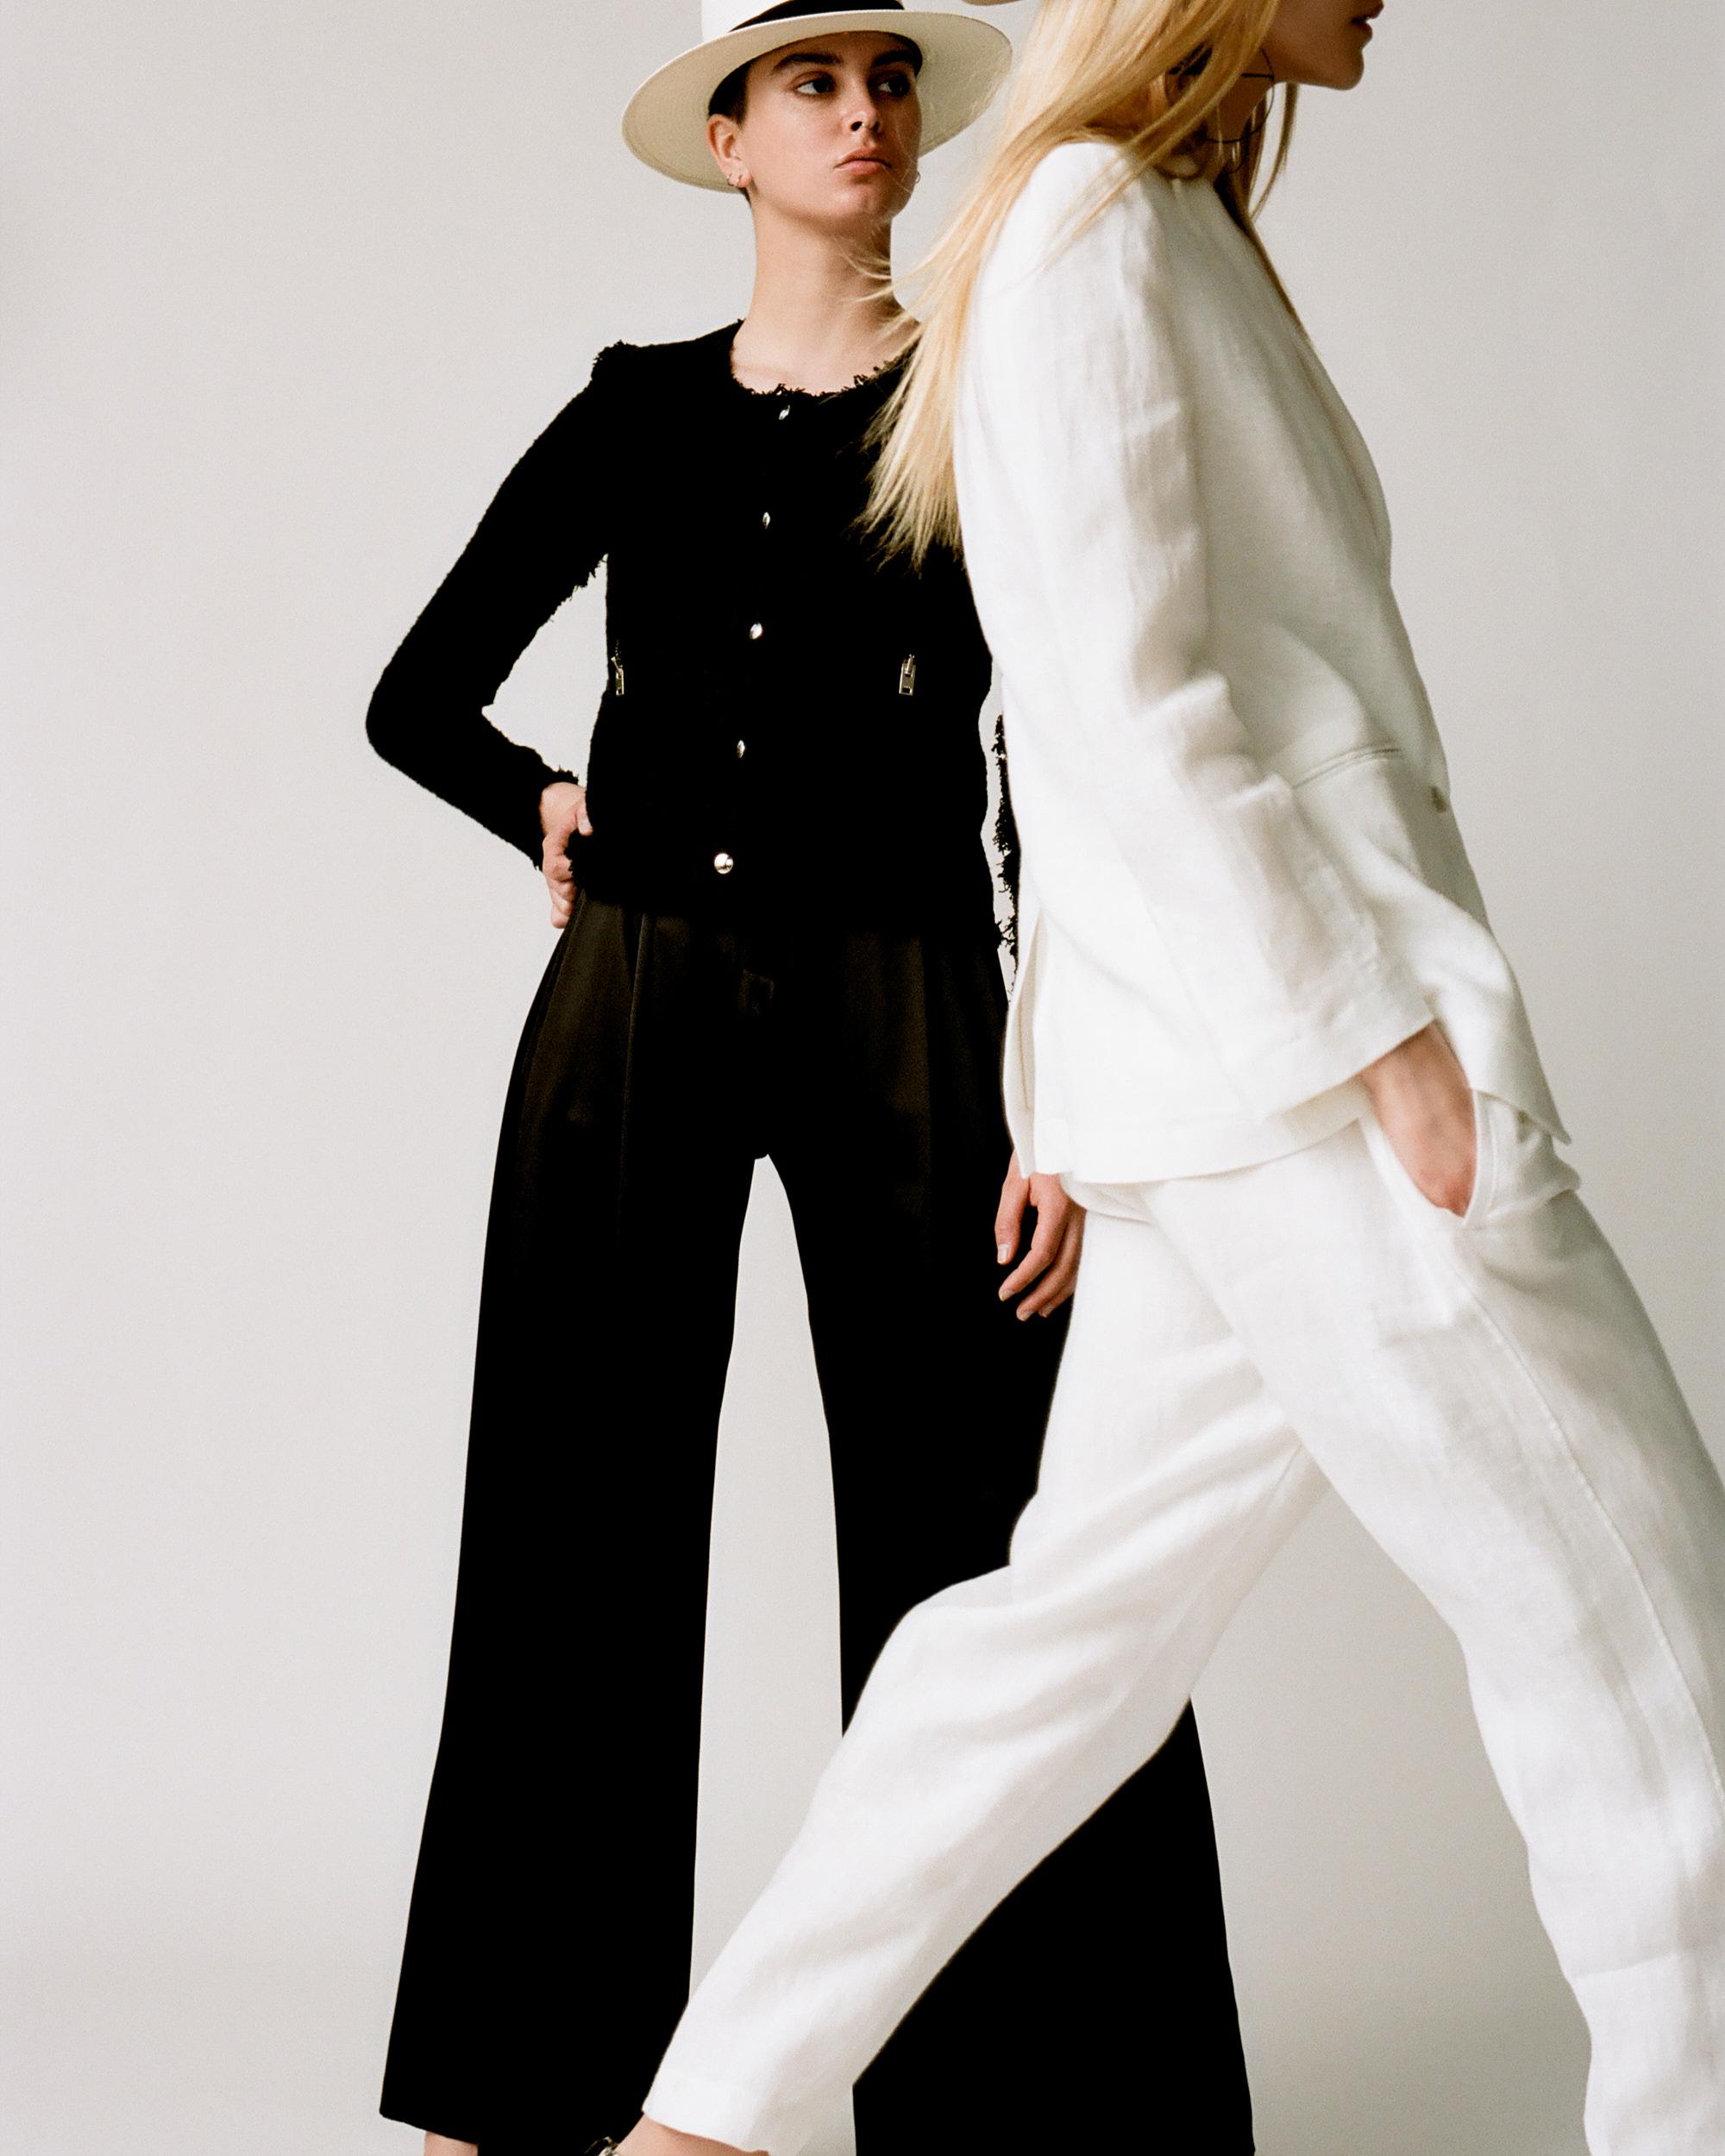 Joe Friend Photography | Fashion Photography | Tula Boutique SS19